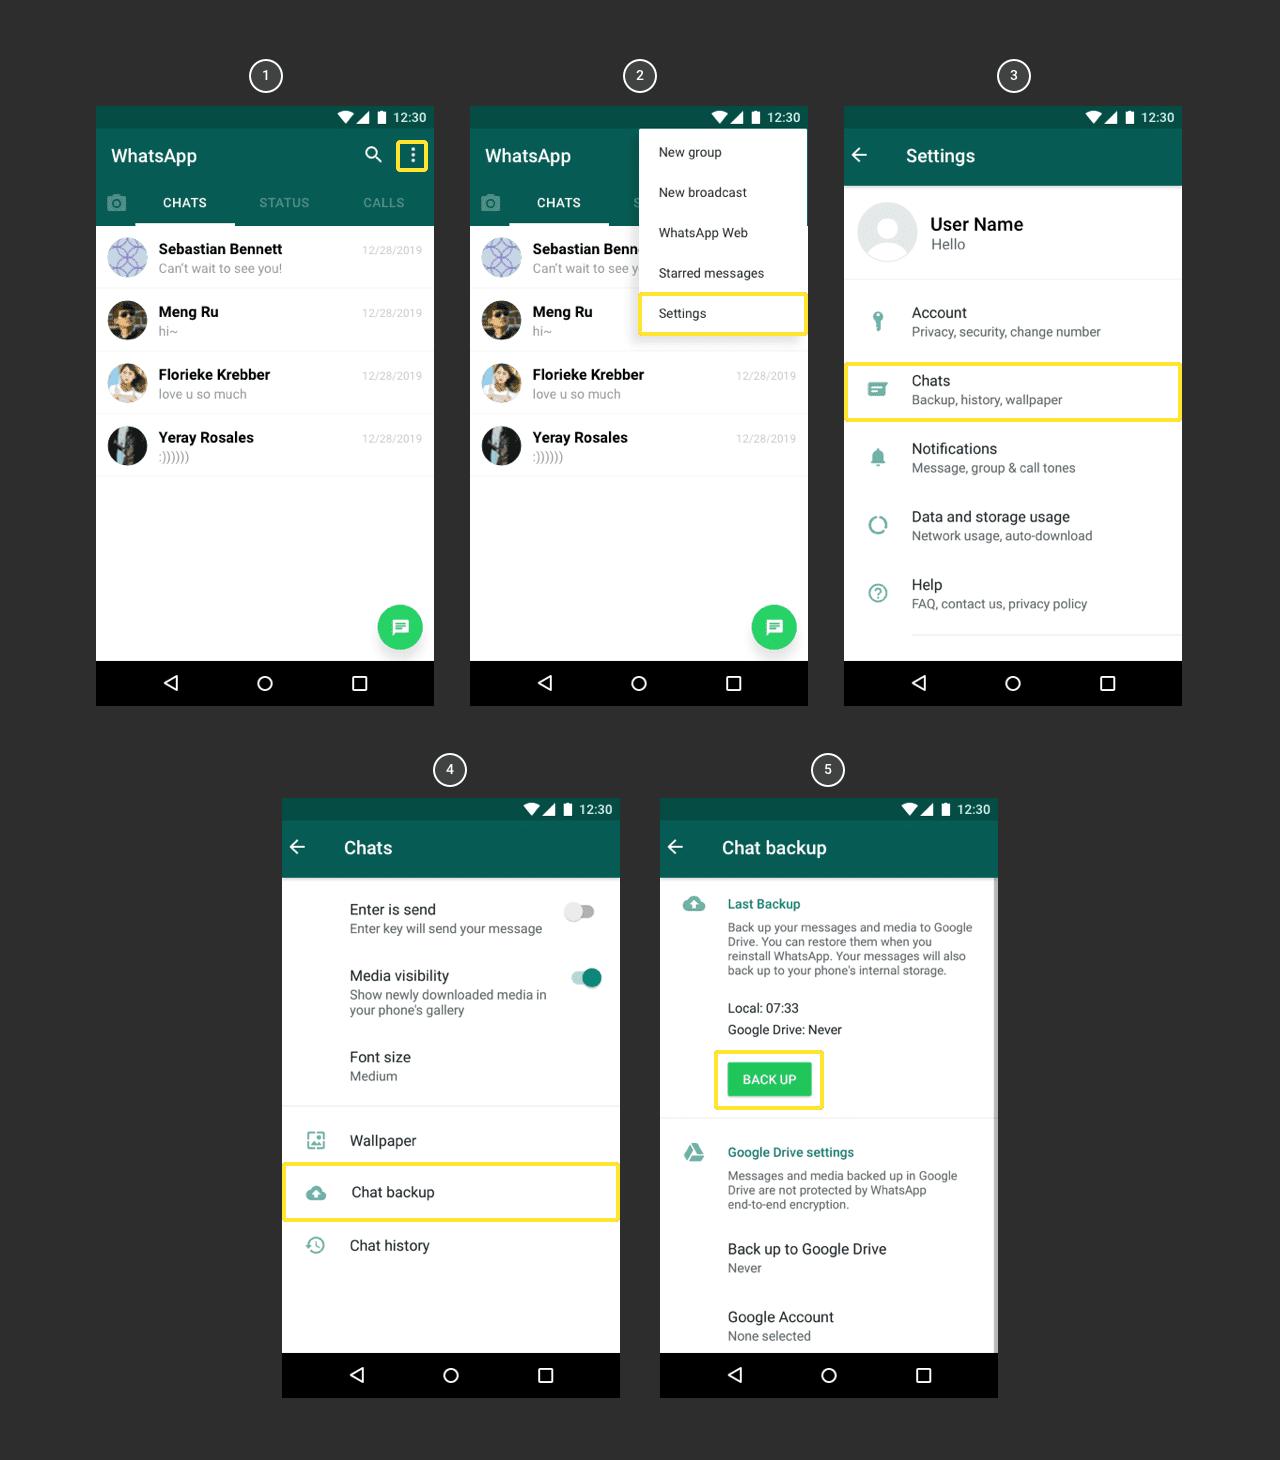 Coocoo Whatsapp Mod Apk Terbaru - Syam Kapuk